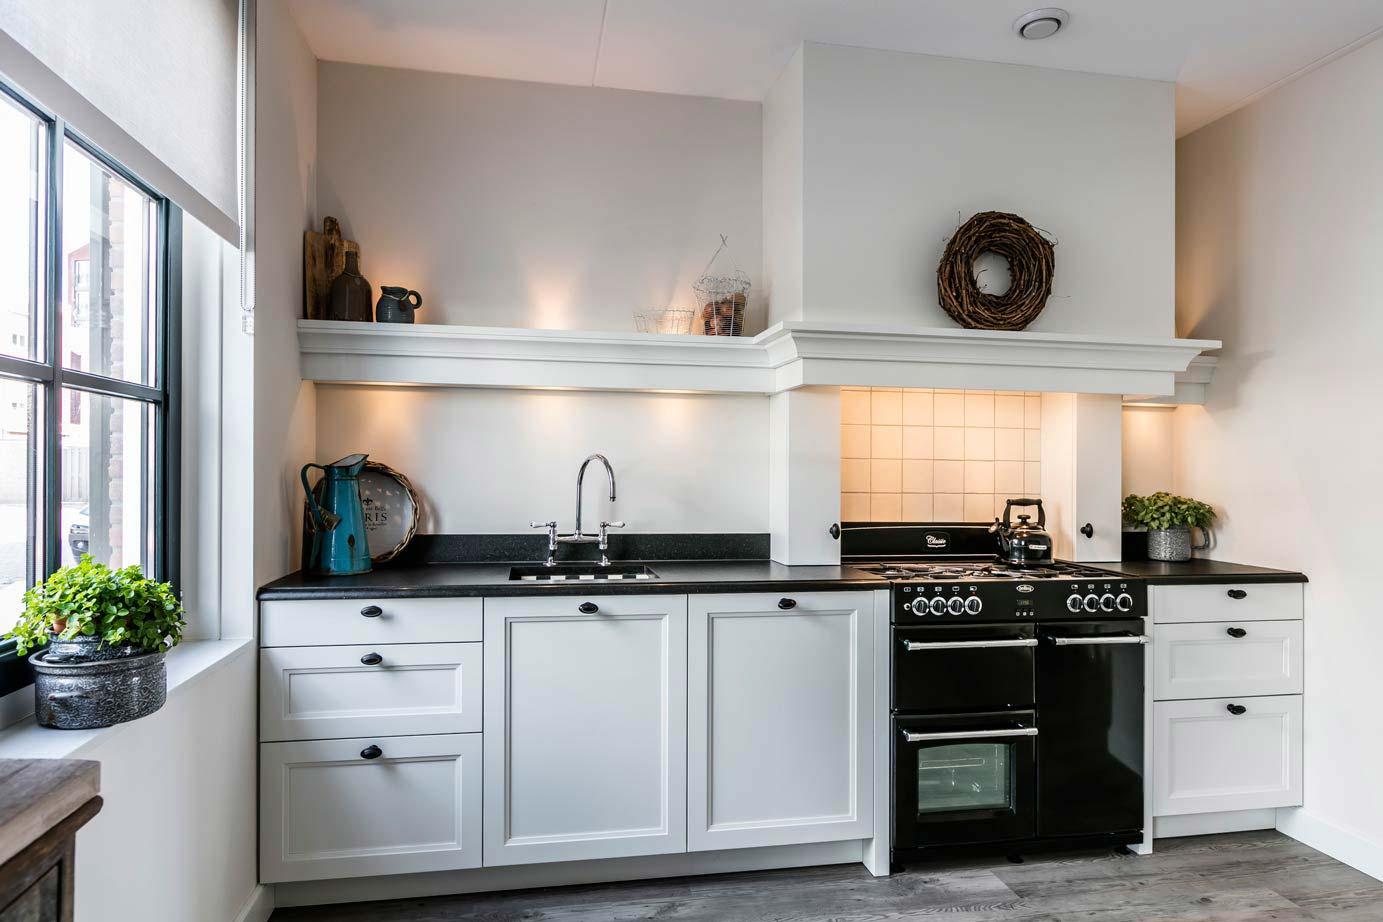 Keukenopstellingen keller keukens